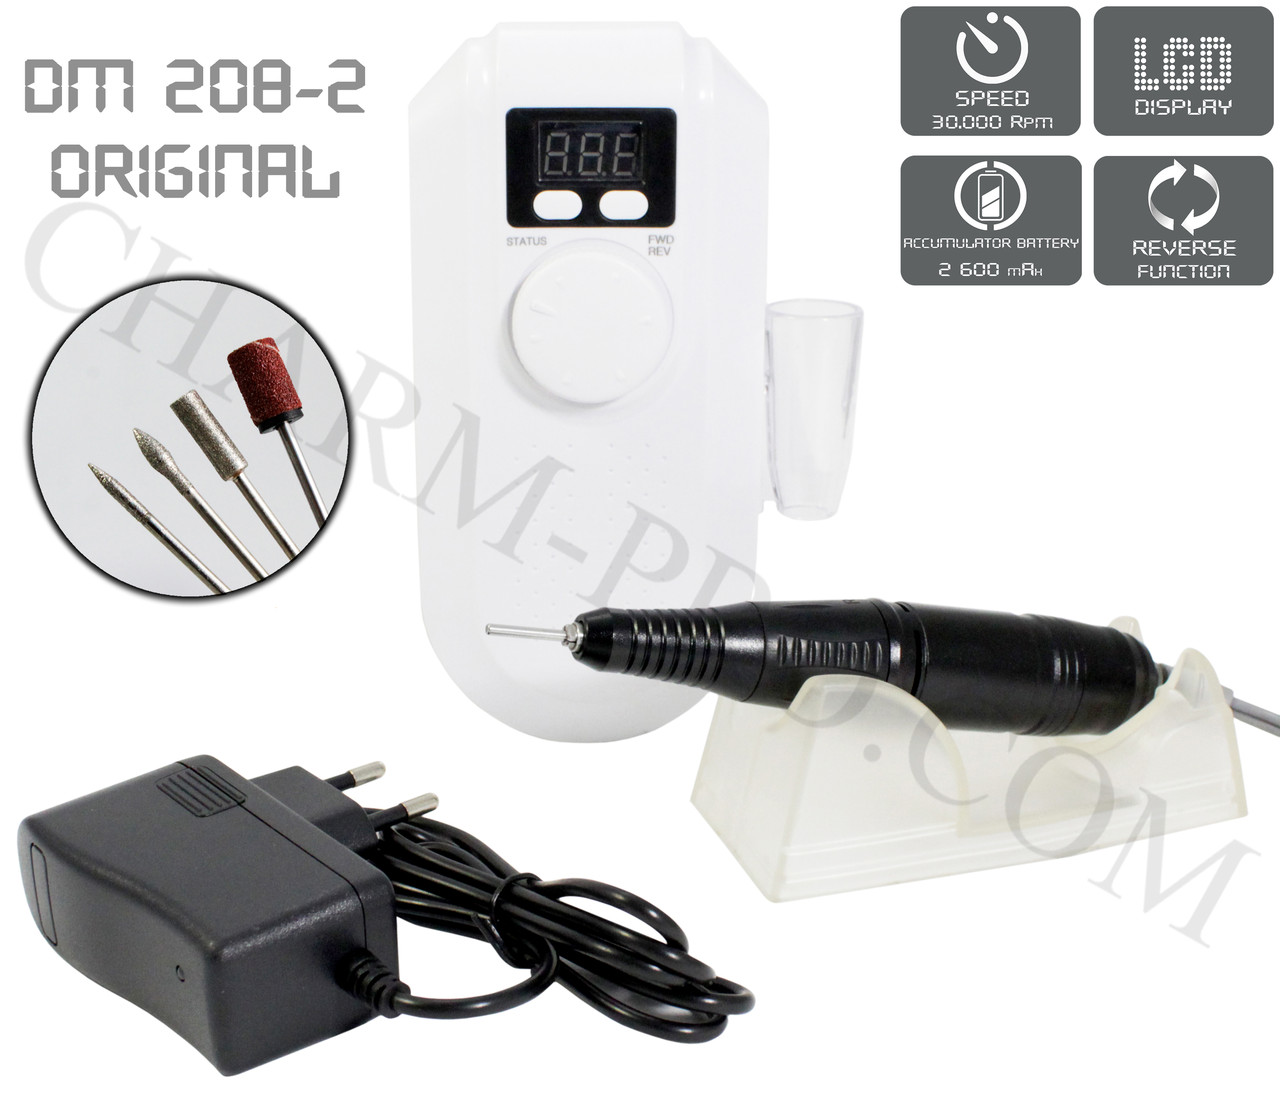 Фрезер для маникюра и педикюра с LCD дисплеем DM-208-2 (30000 об/мин)